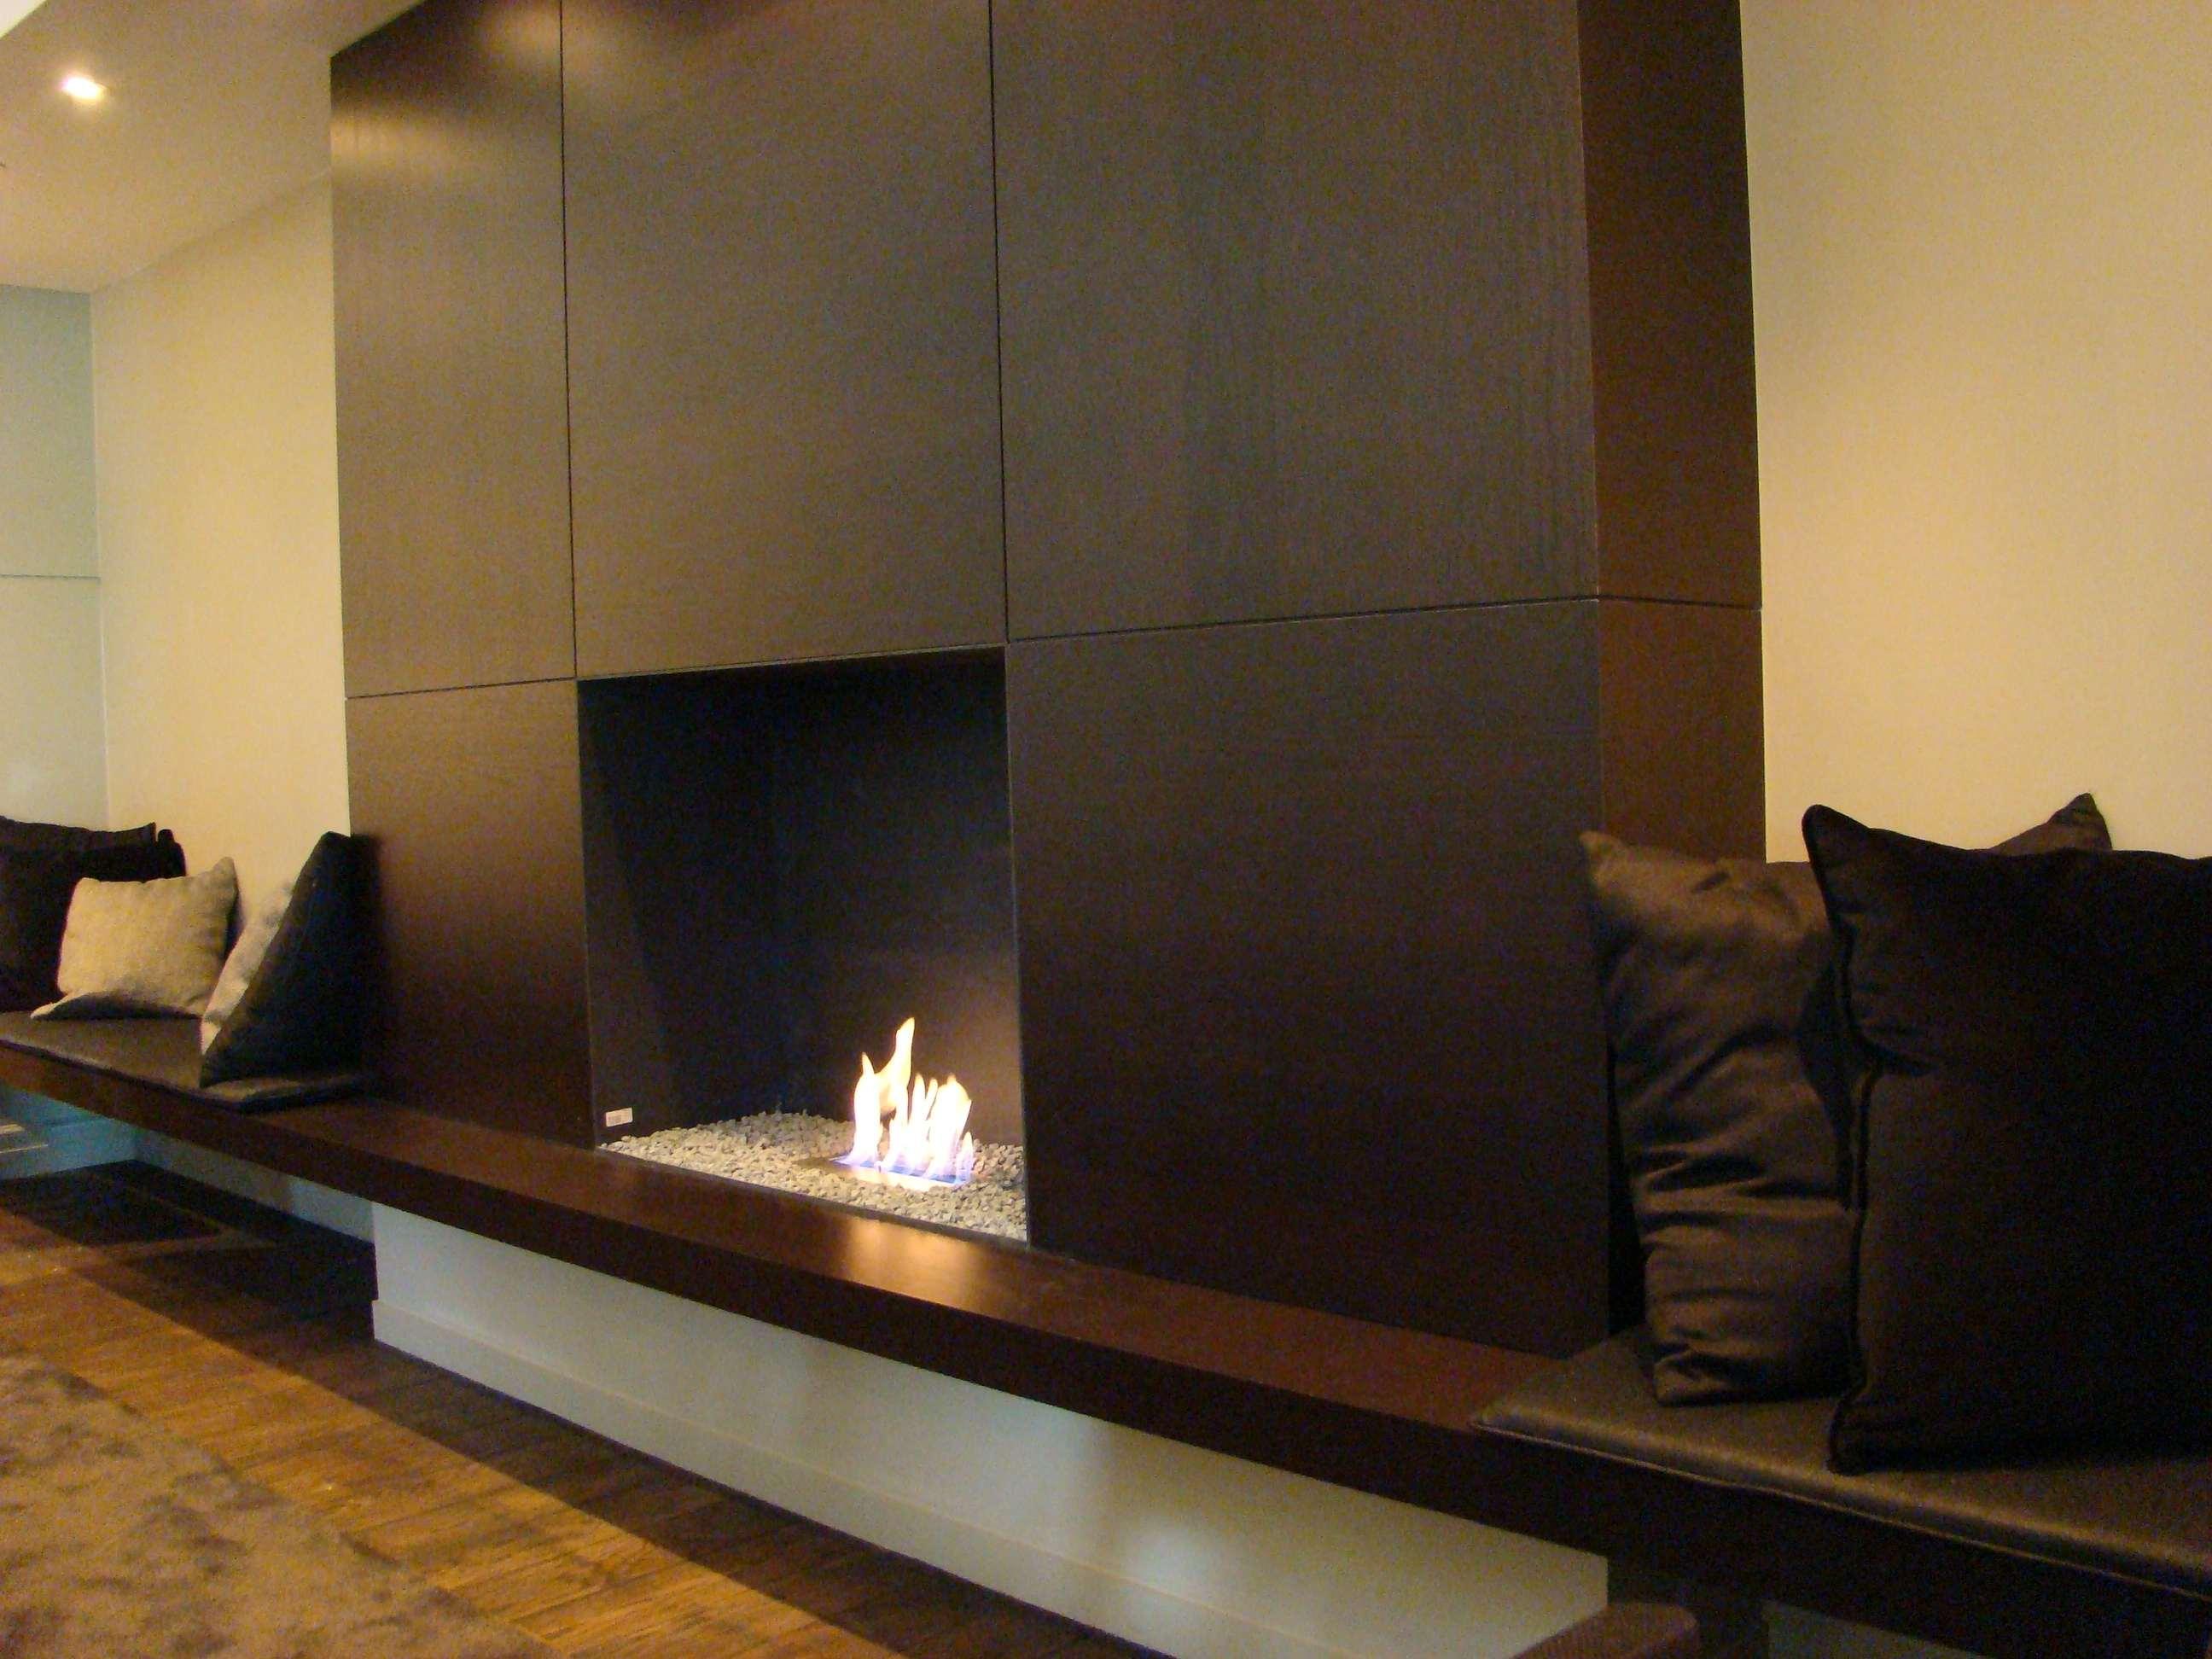 Tv Meubel Tegels : Tv meubel tegels. tv meubel tegels with tv meubel tegels. cool